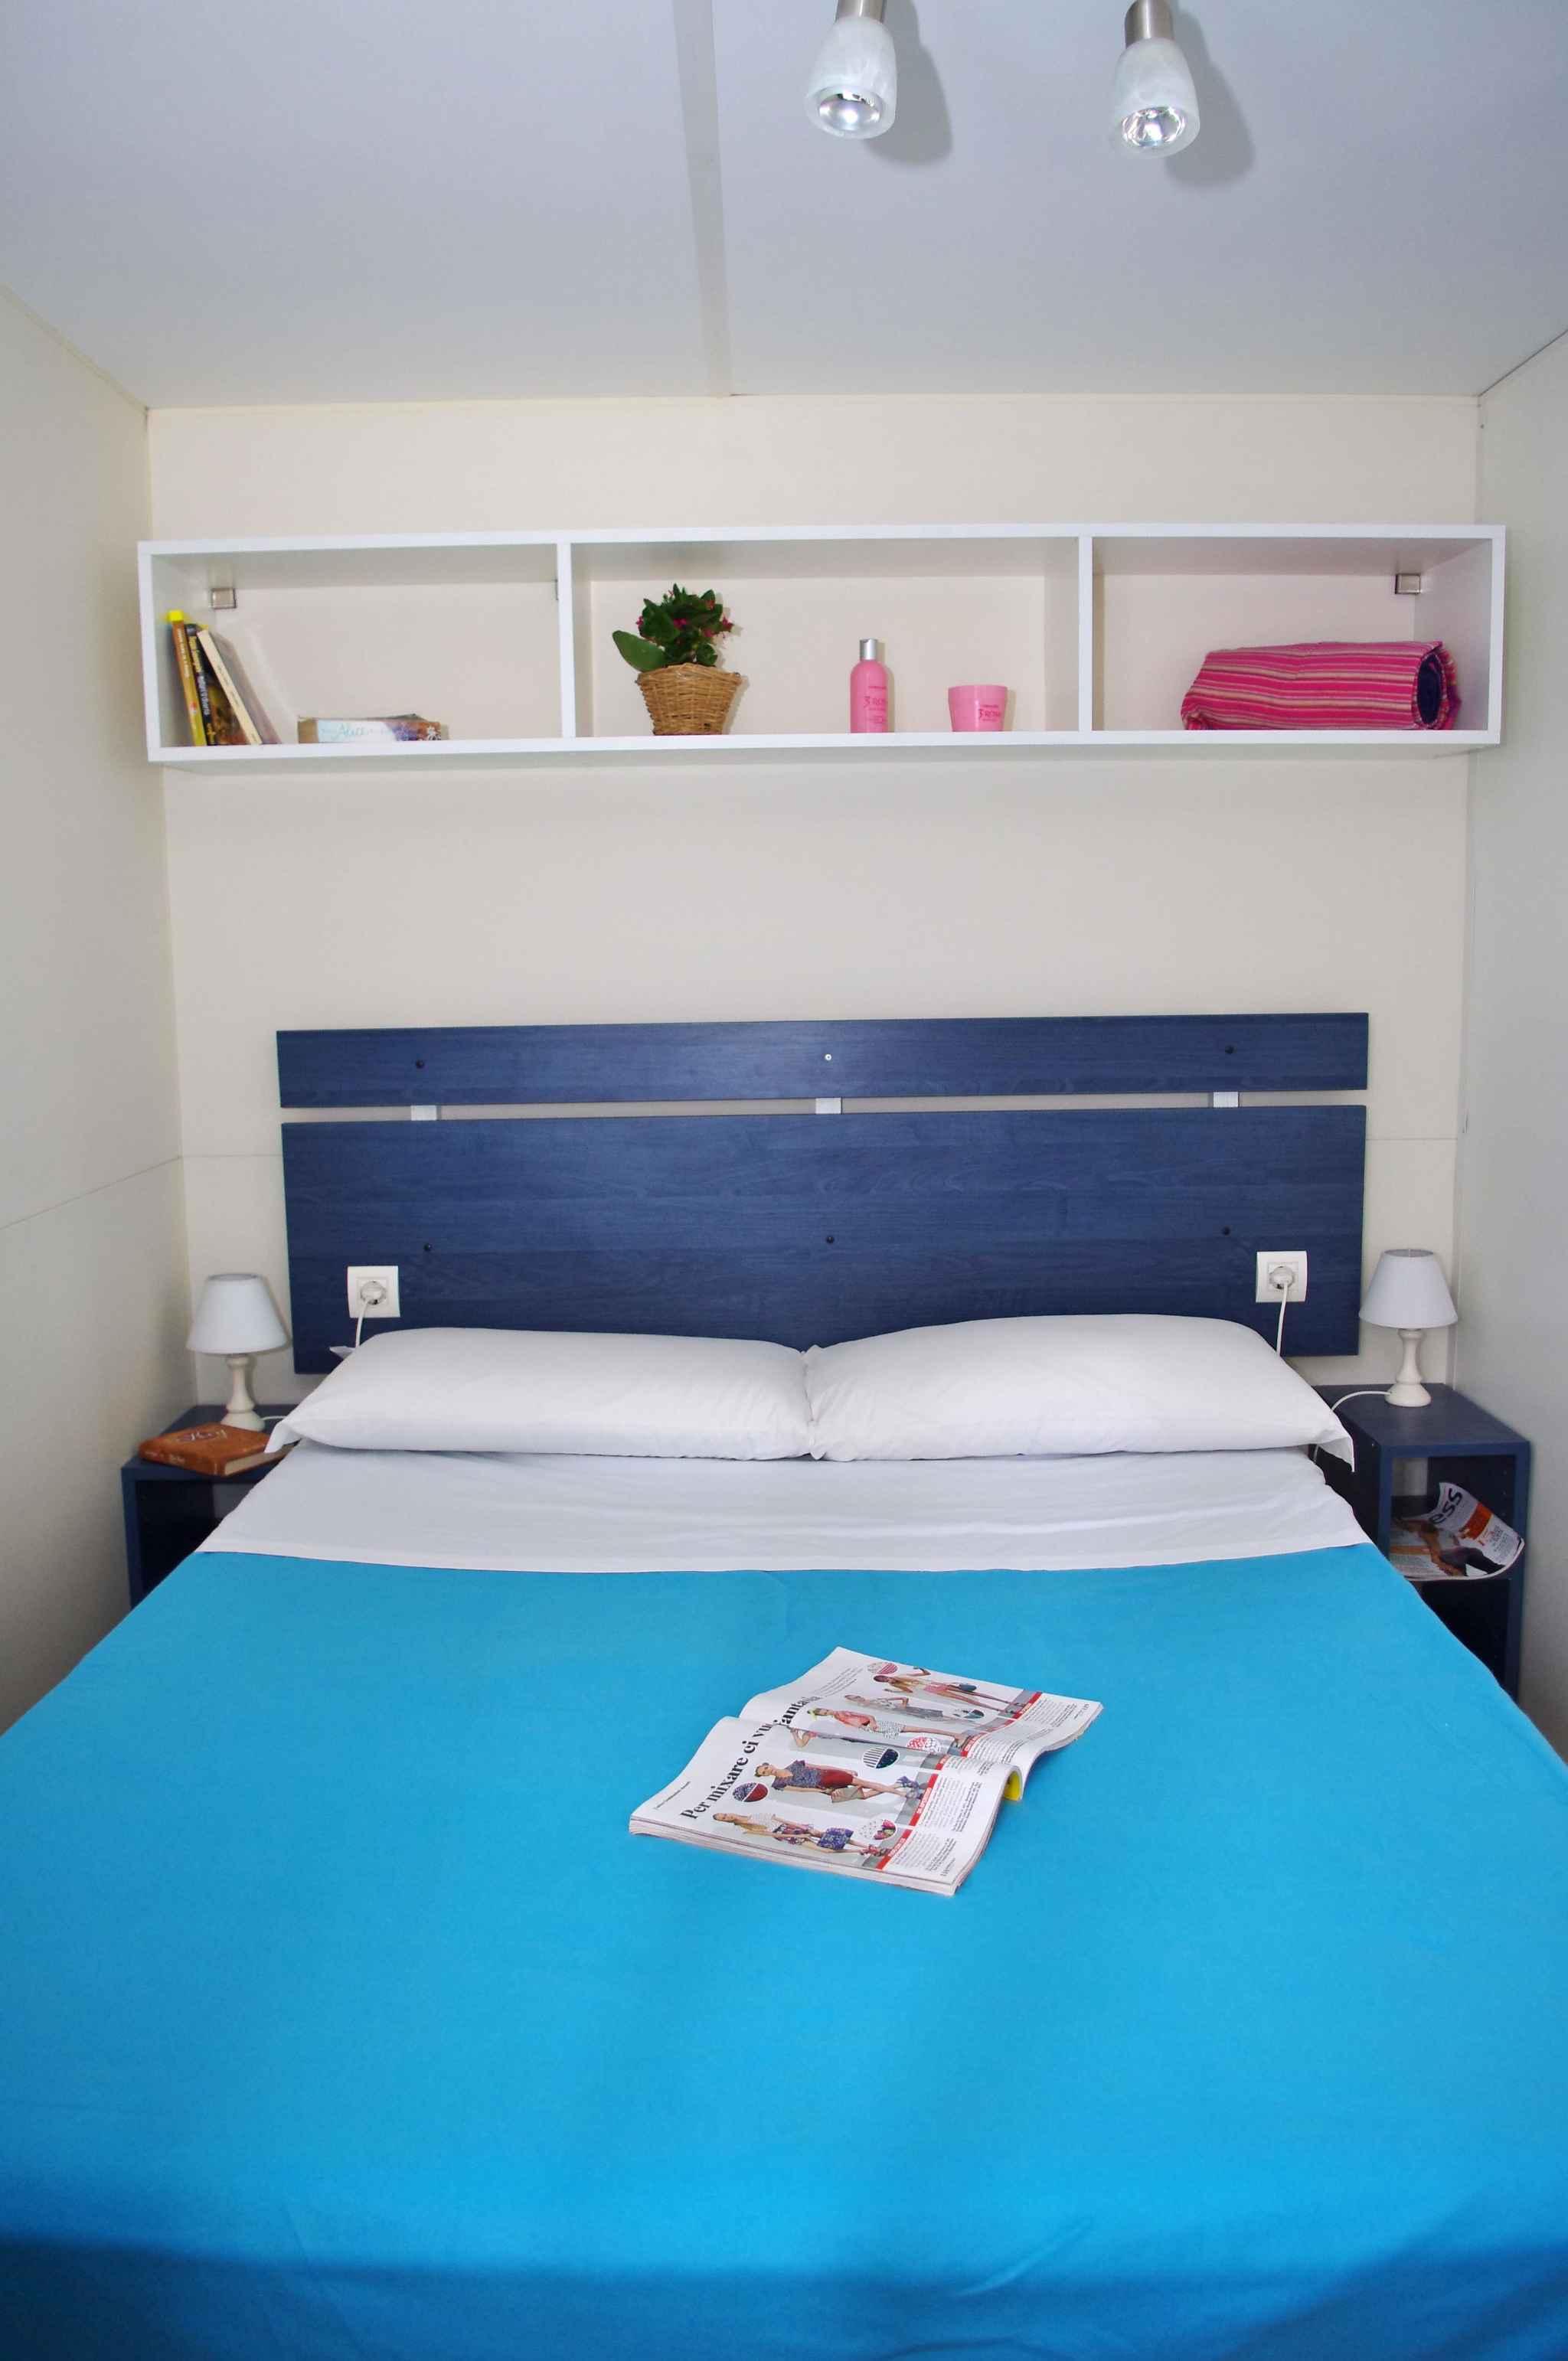 Appartement de vacances Mobilehome mit Tischtennis und Fahrradverleih (2483443), San Vito Lo Capo, Trapani, Sicile, Italie, image 14